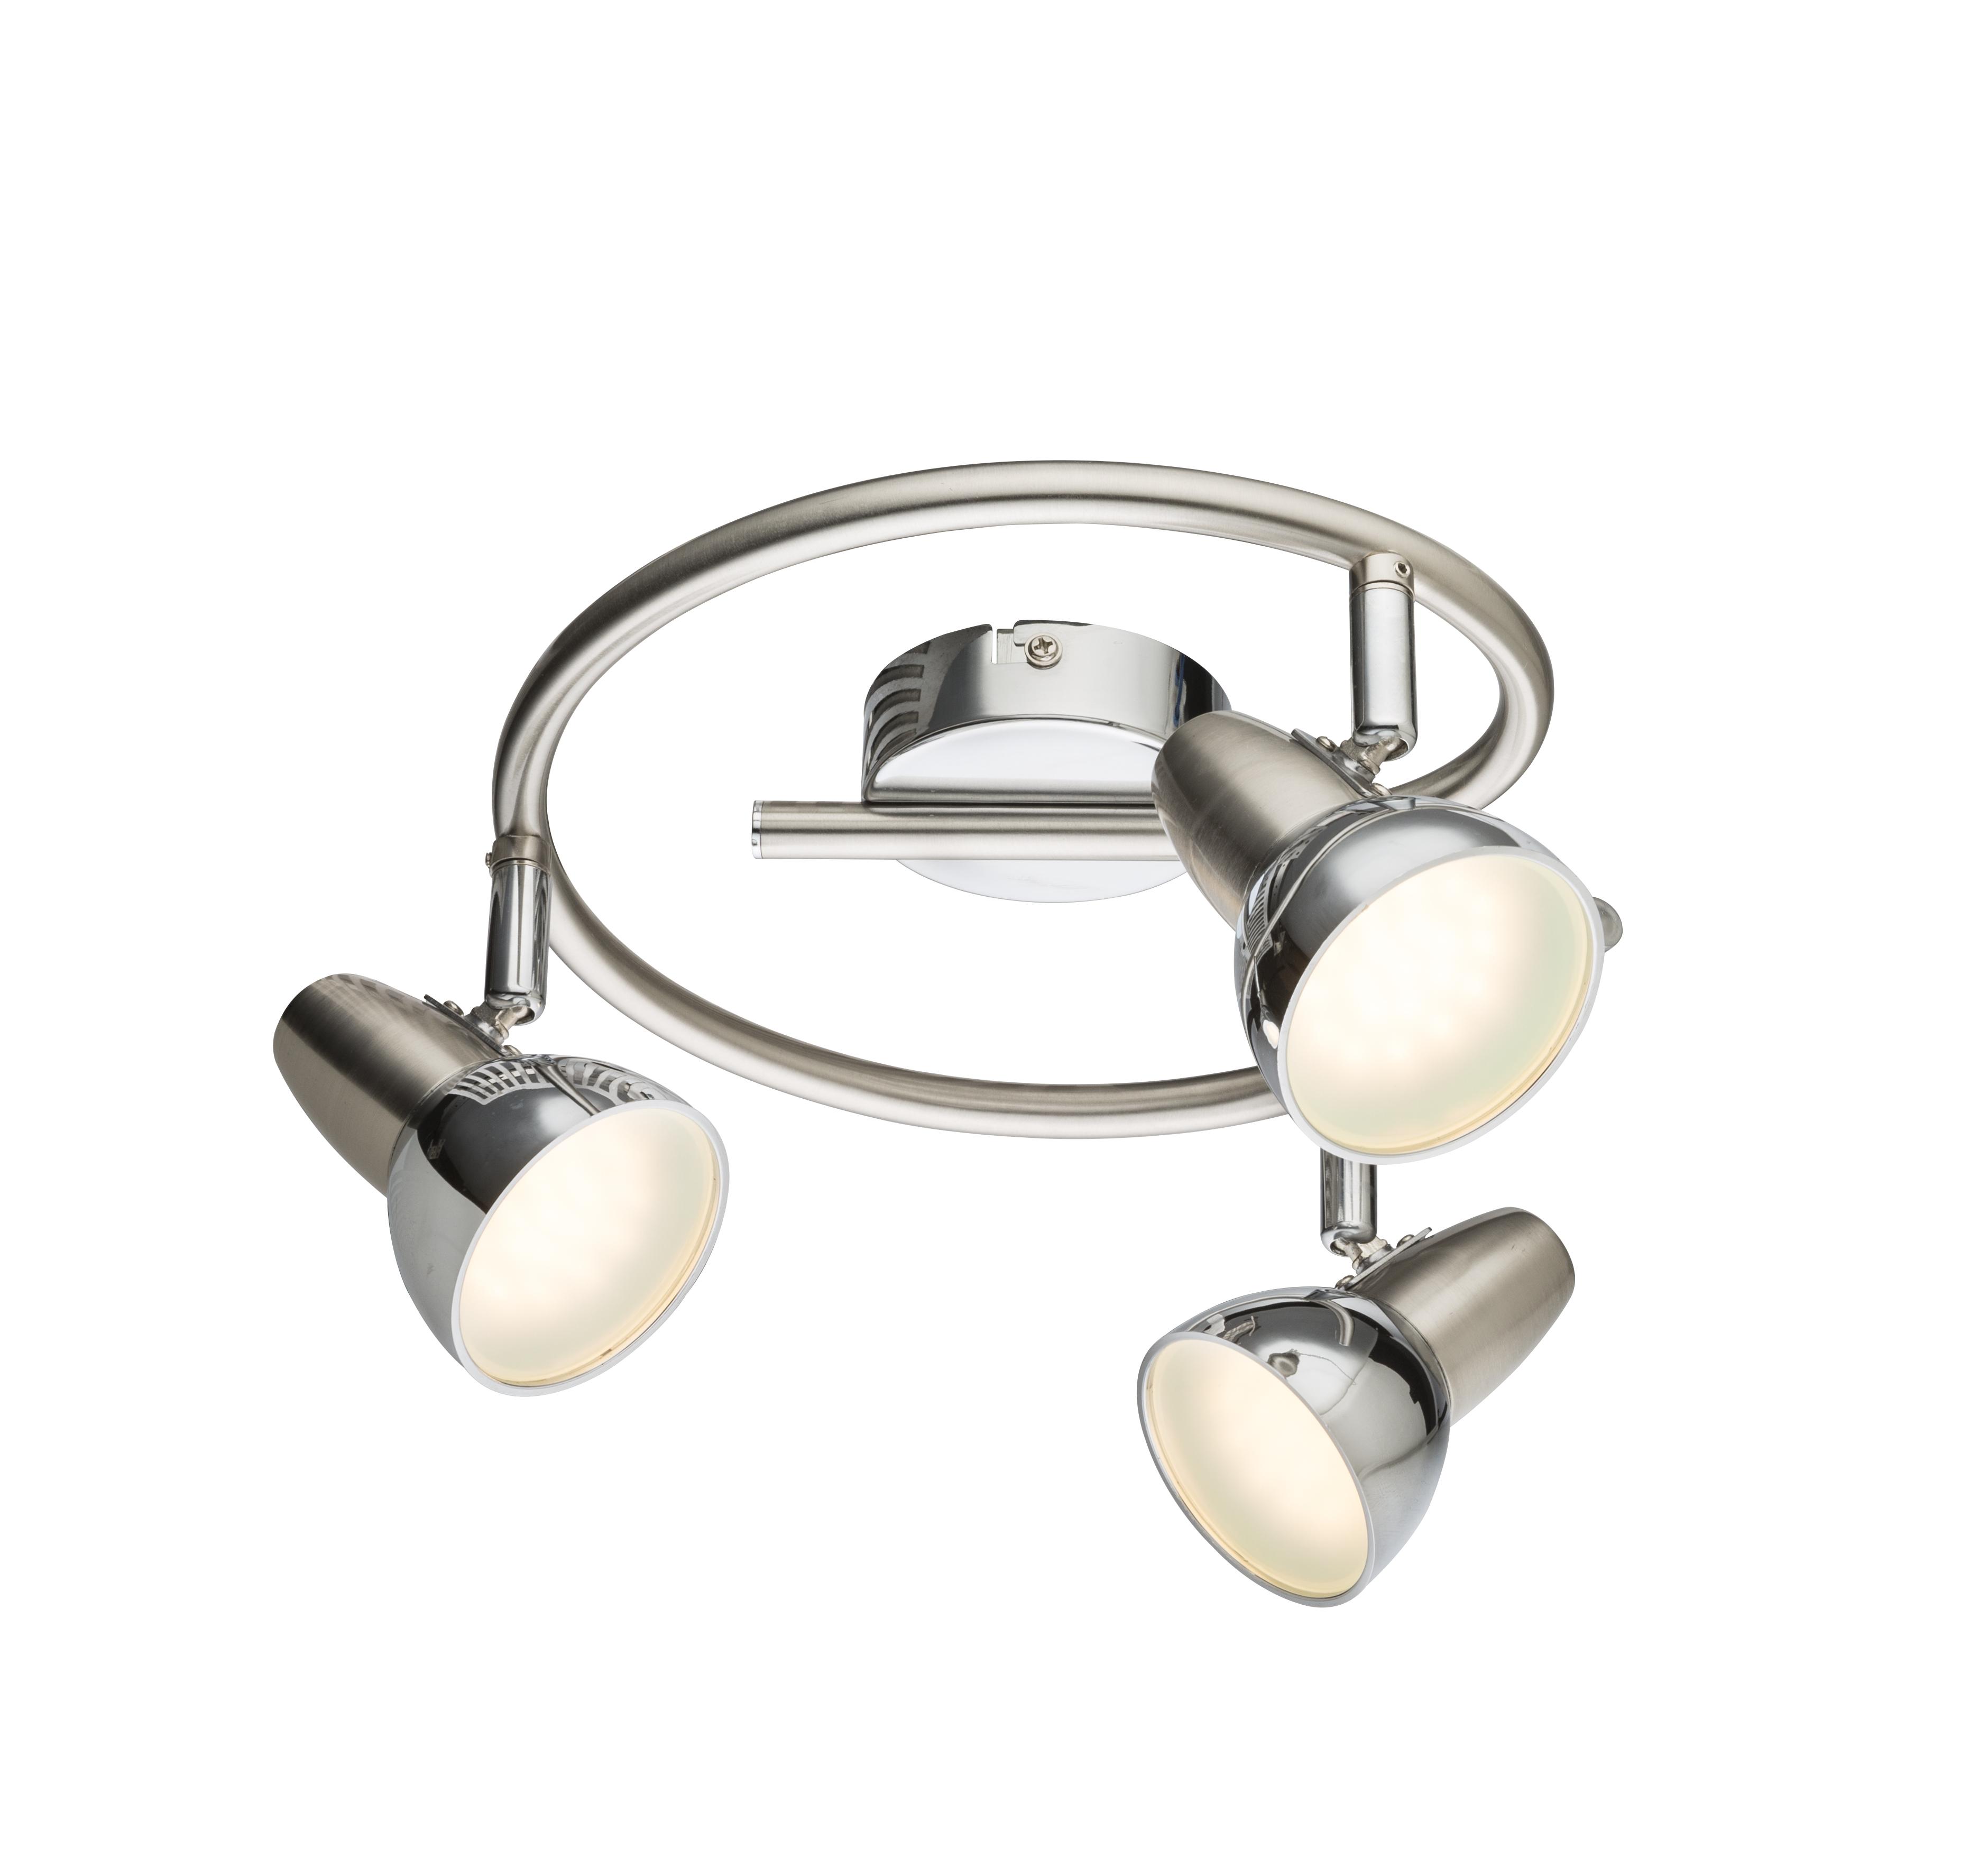 купить Настенно-потолочный светильник Настенно-потолочный светильник Cappuccino по цене 5660 рублей